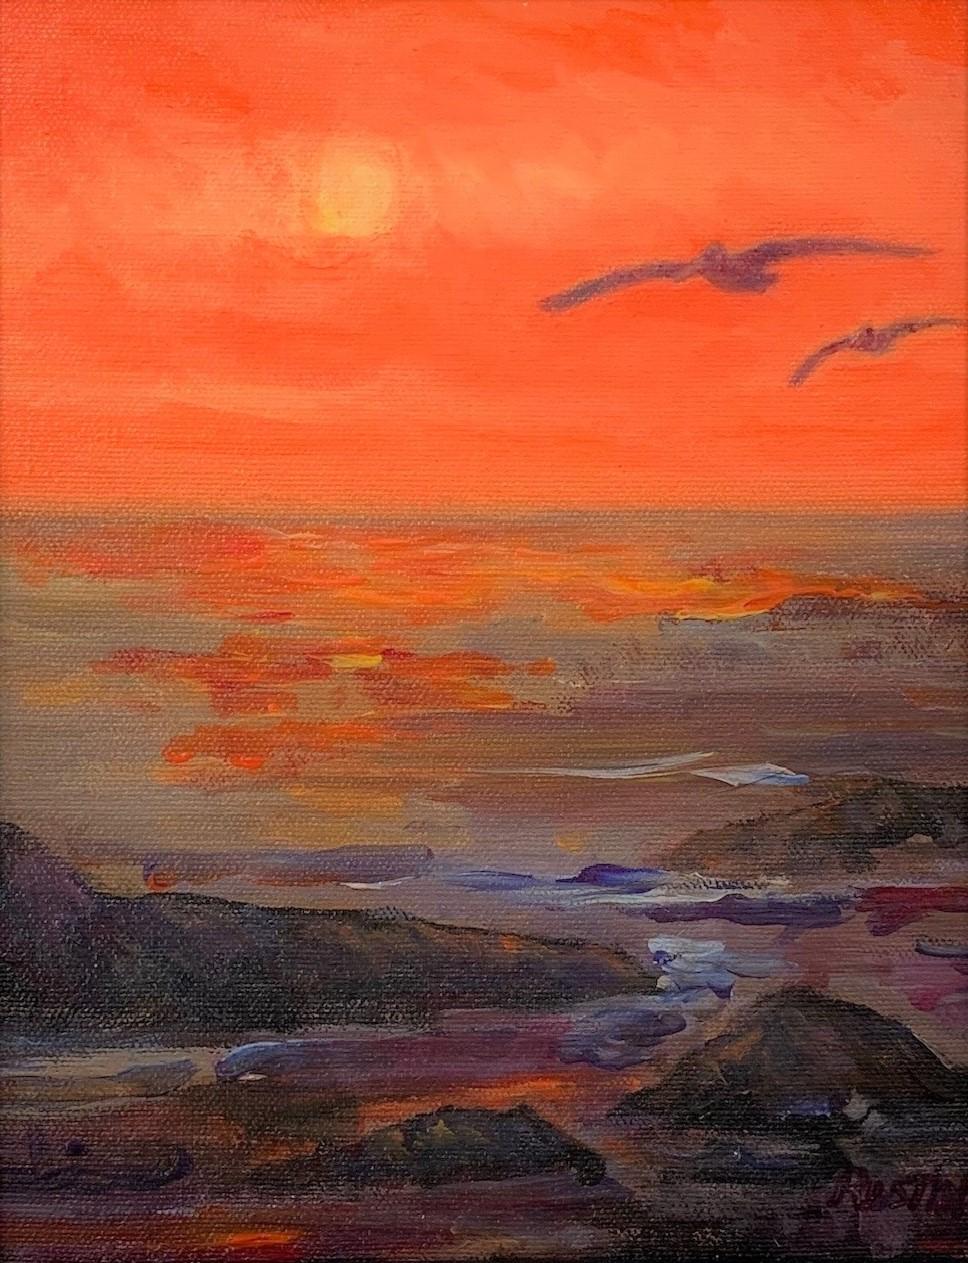 Sunset Cruisin' - Holec